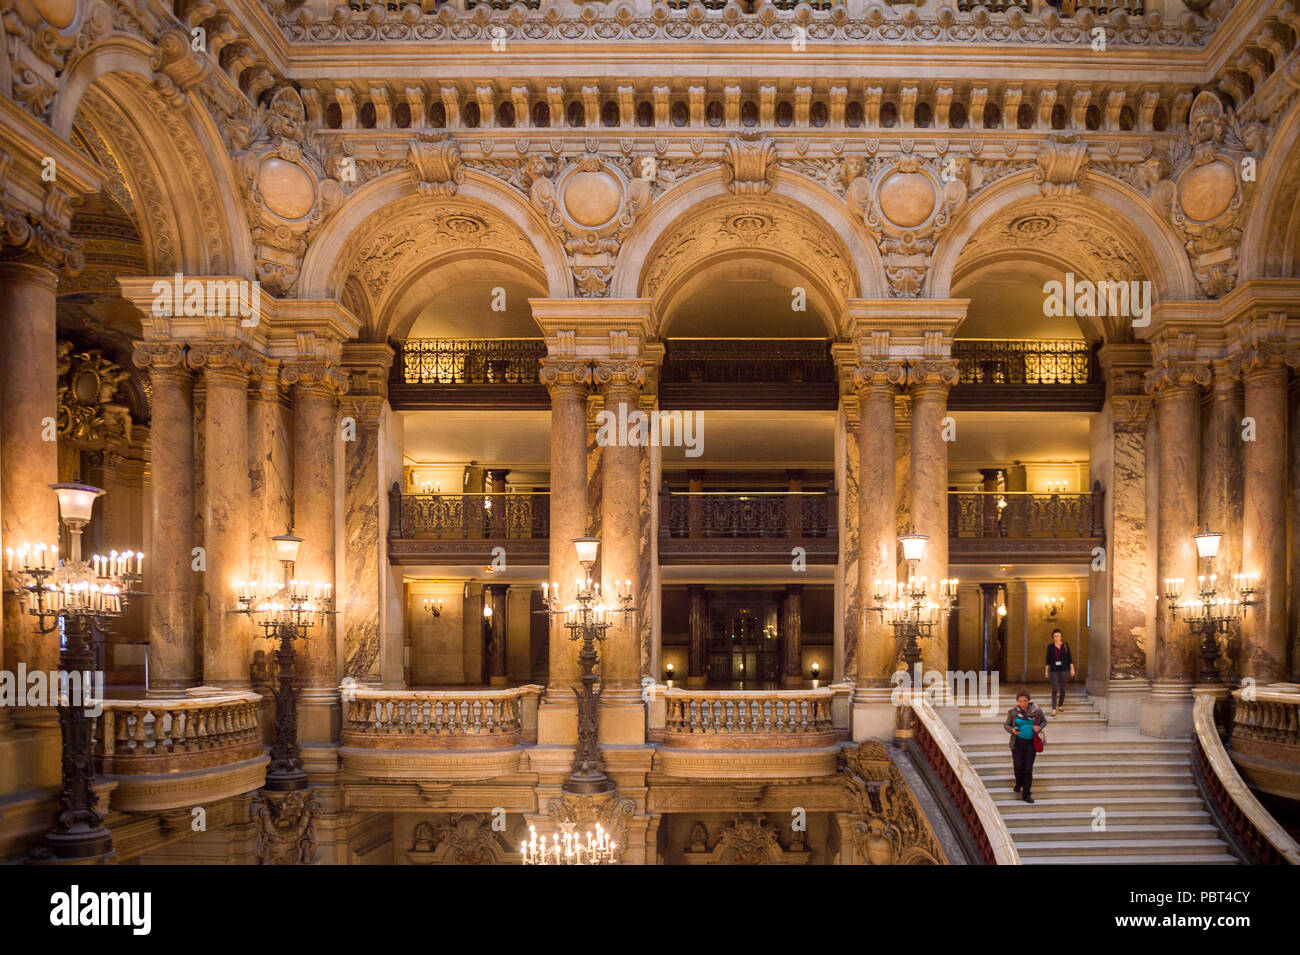 Paris France Jun 6 2015 Decoration Of The Palais Garnier Opera